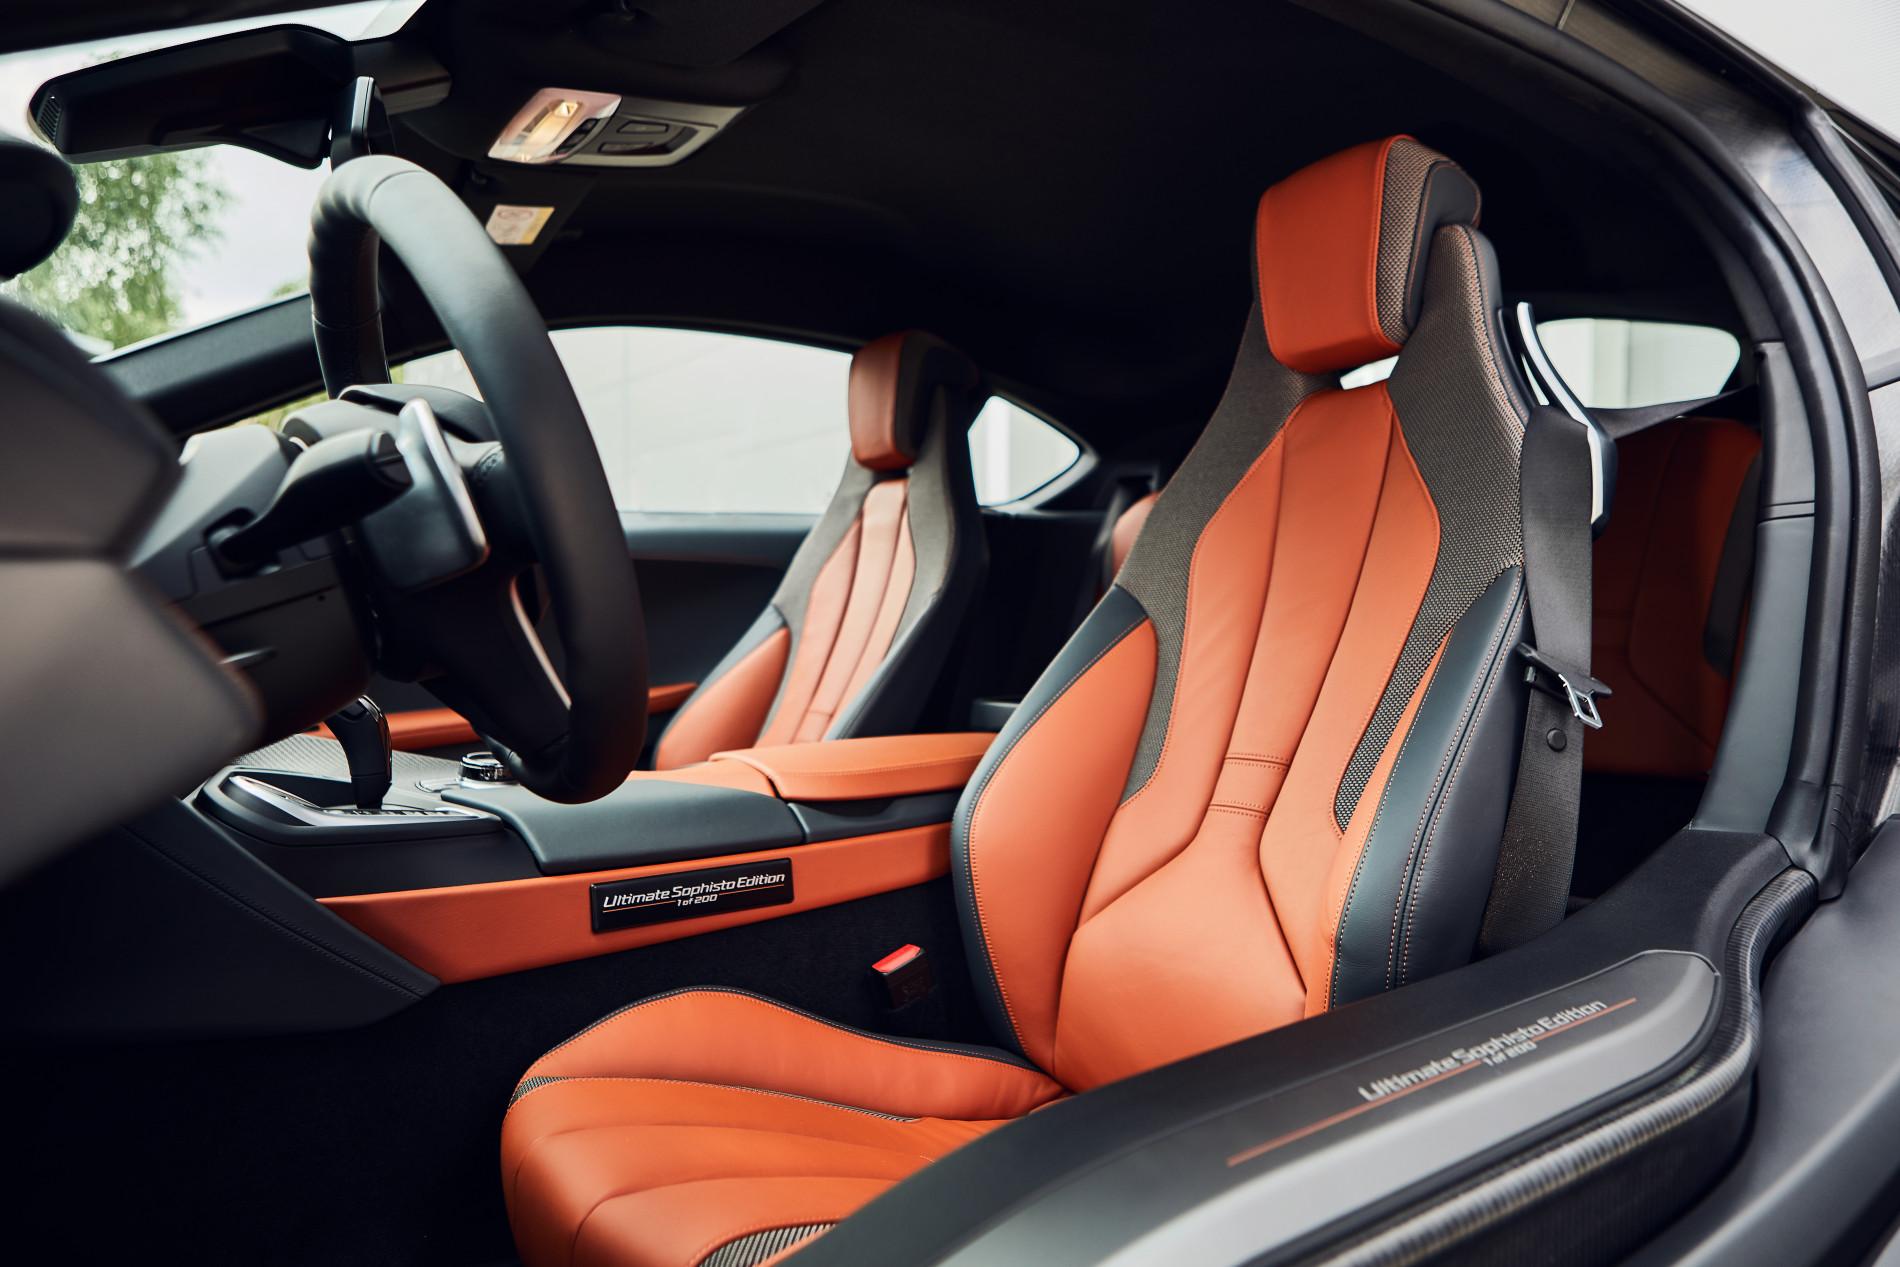 BMW i8 Ultimate Sophisto Edition - BMW i8 Ultimate Sophisto Edition